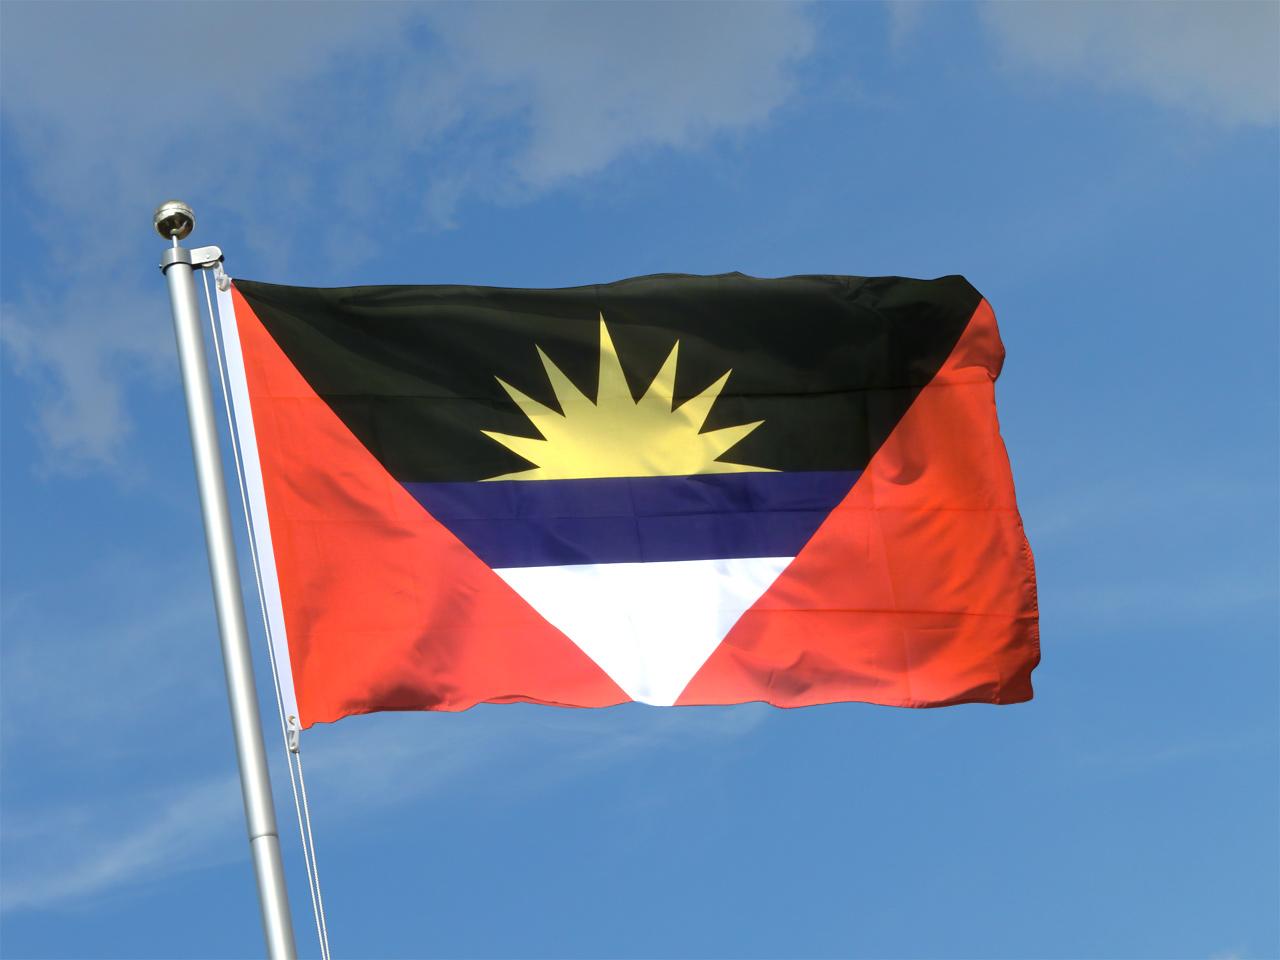 Кабмин одобрил проект соглашения о безвизе с Антигуа и Барбуда